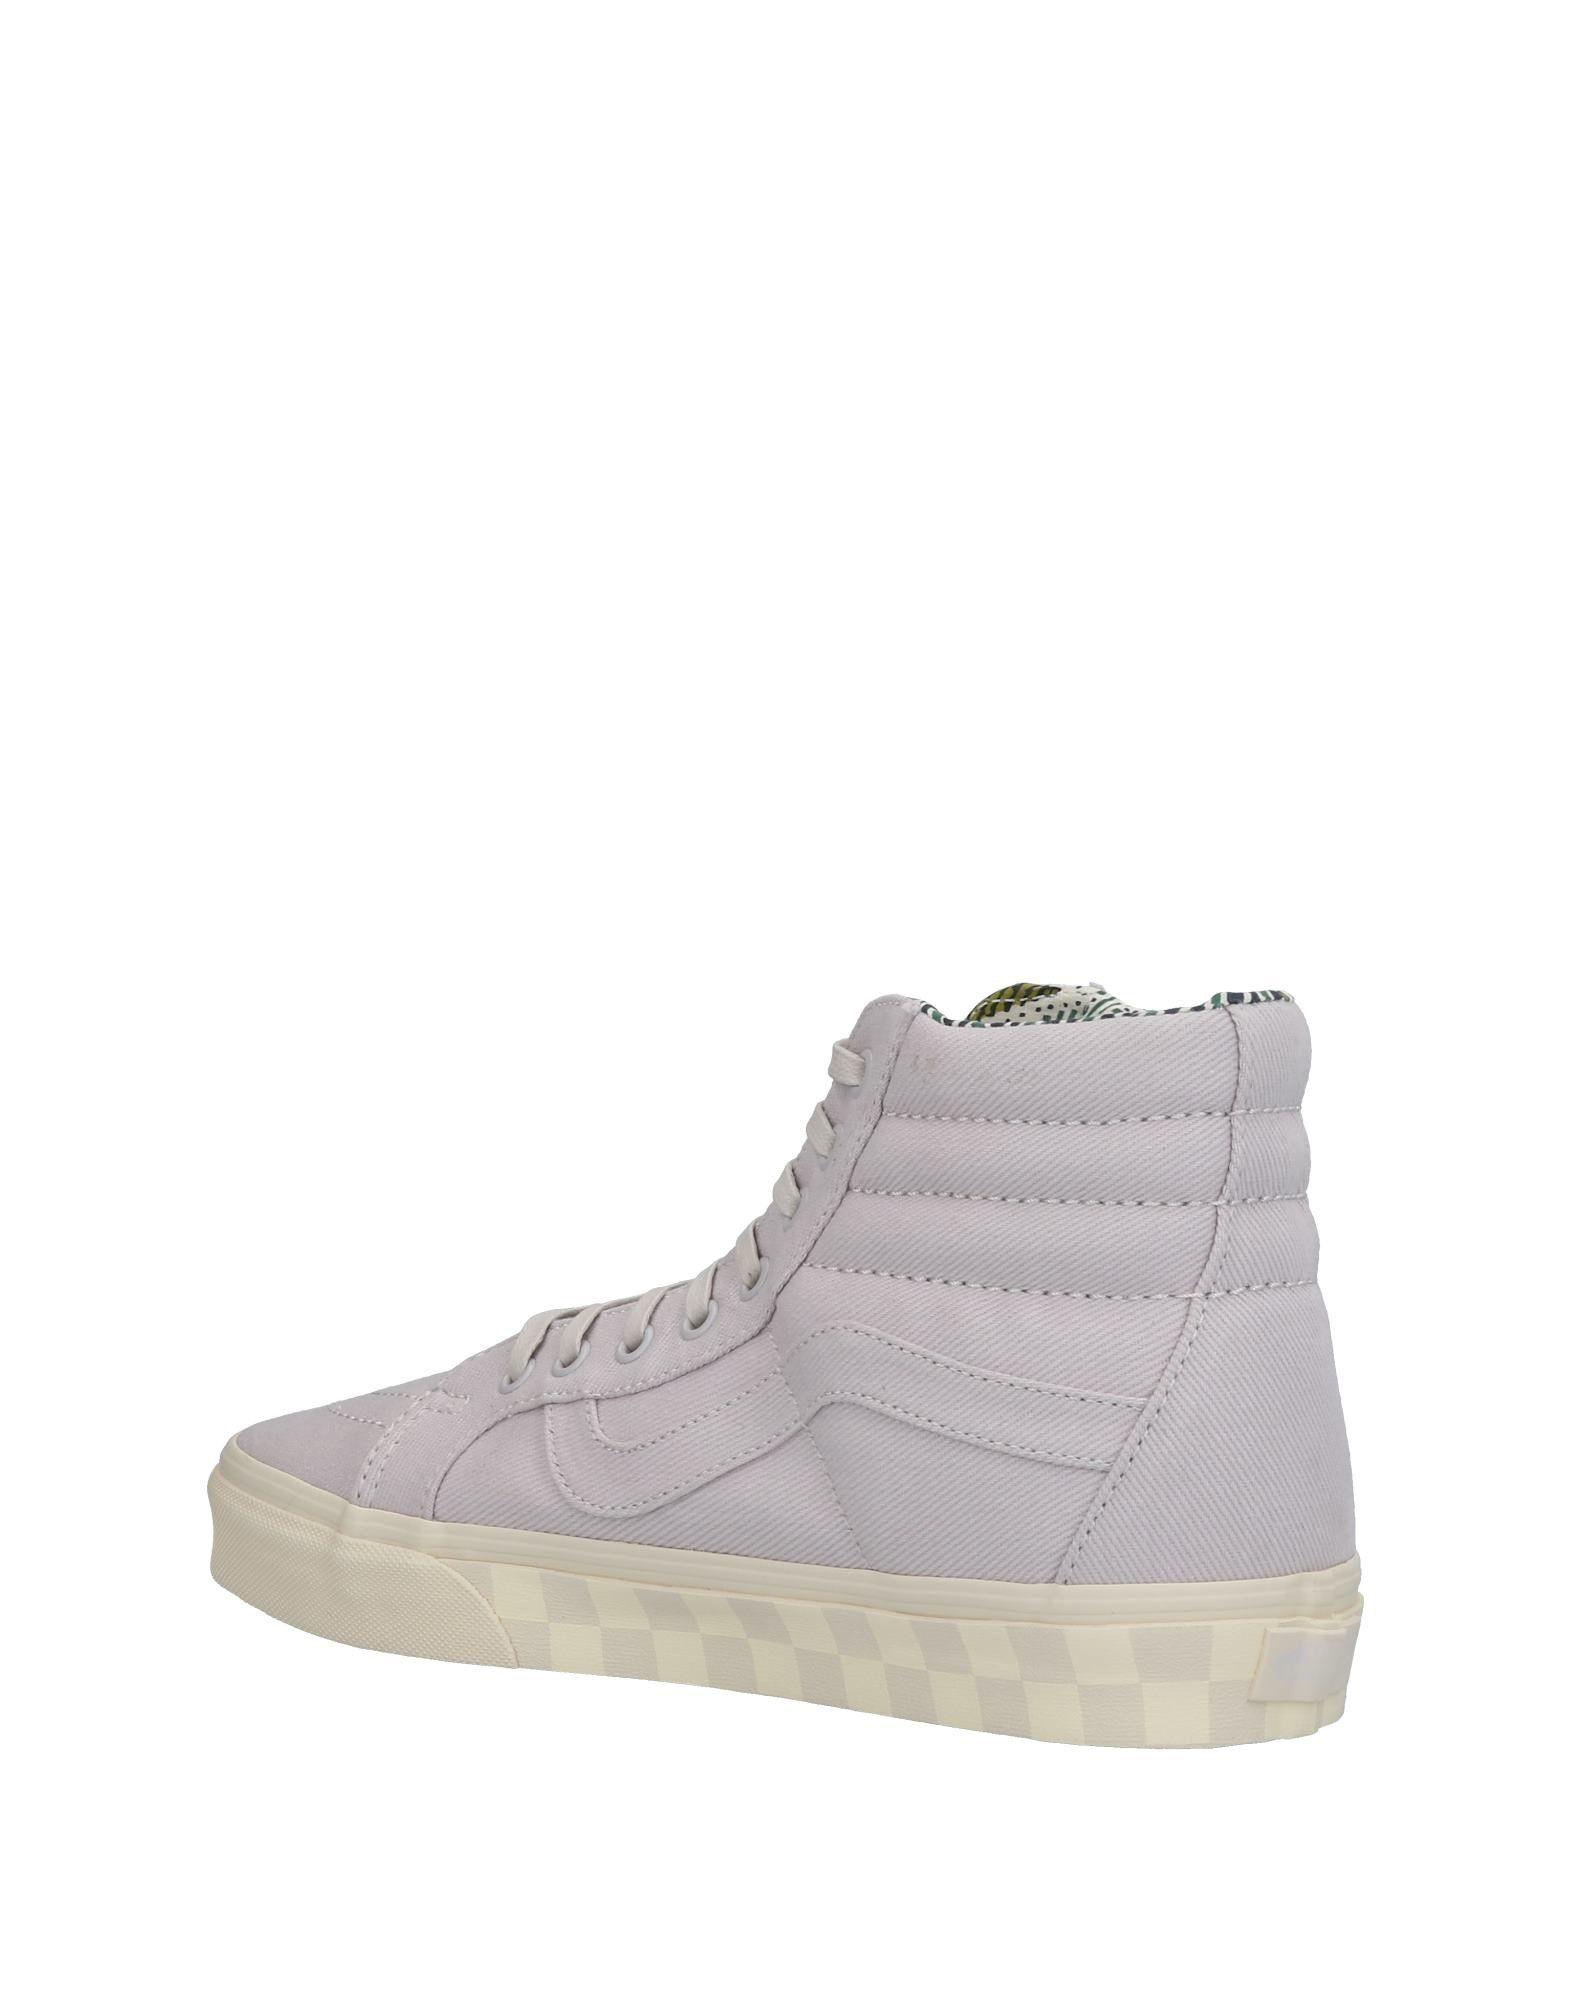 Moda Sneakers Vans Uomo - 11429354FH